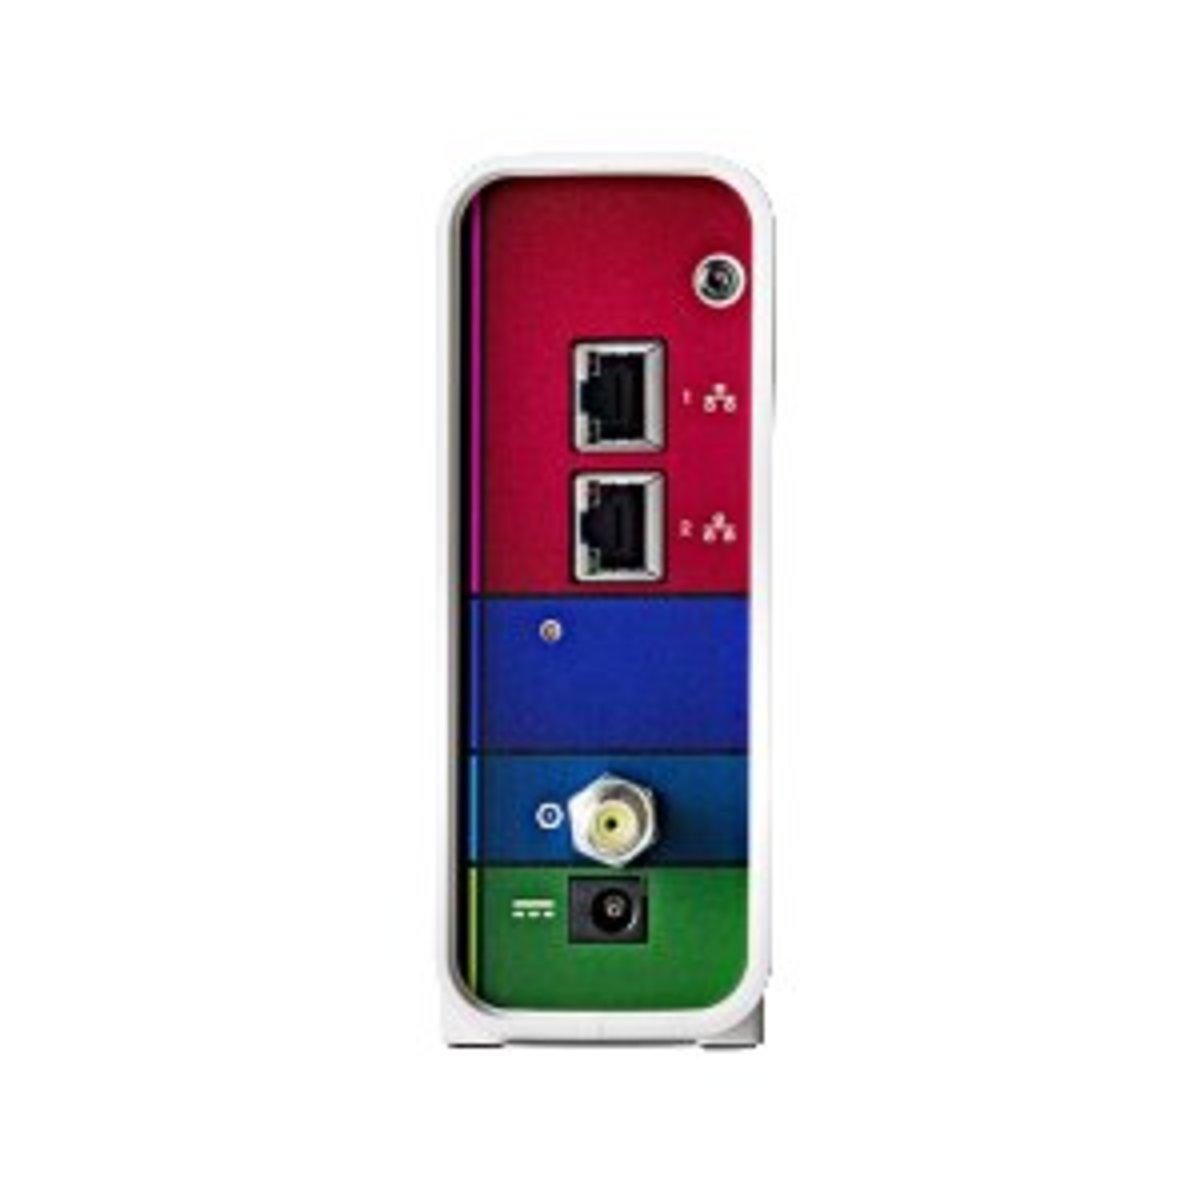 The ports of the Motorola SBG6700-AC